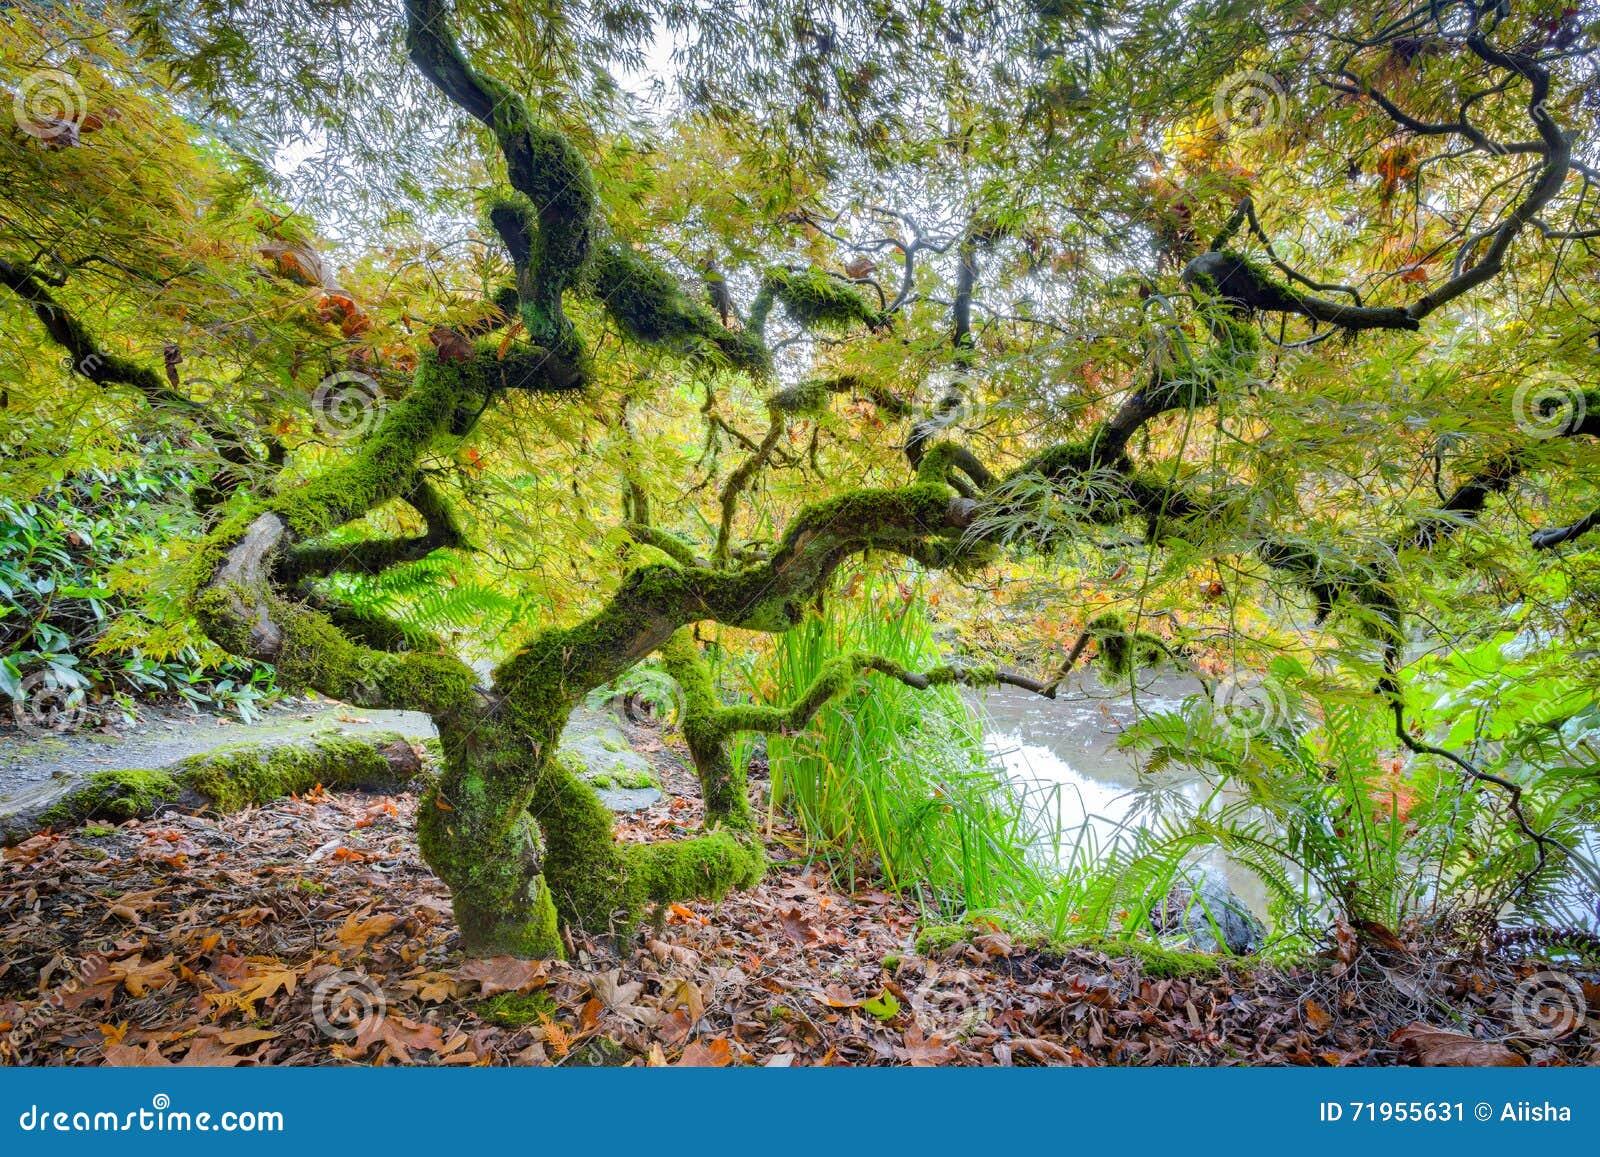 Acero Giapponese Verde albero di acero giapponese verde immagine stock - immagine